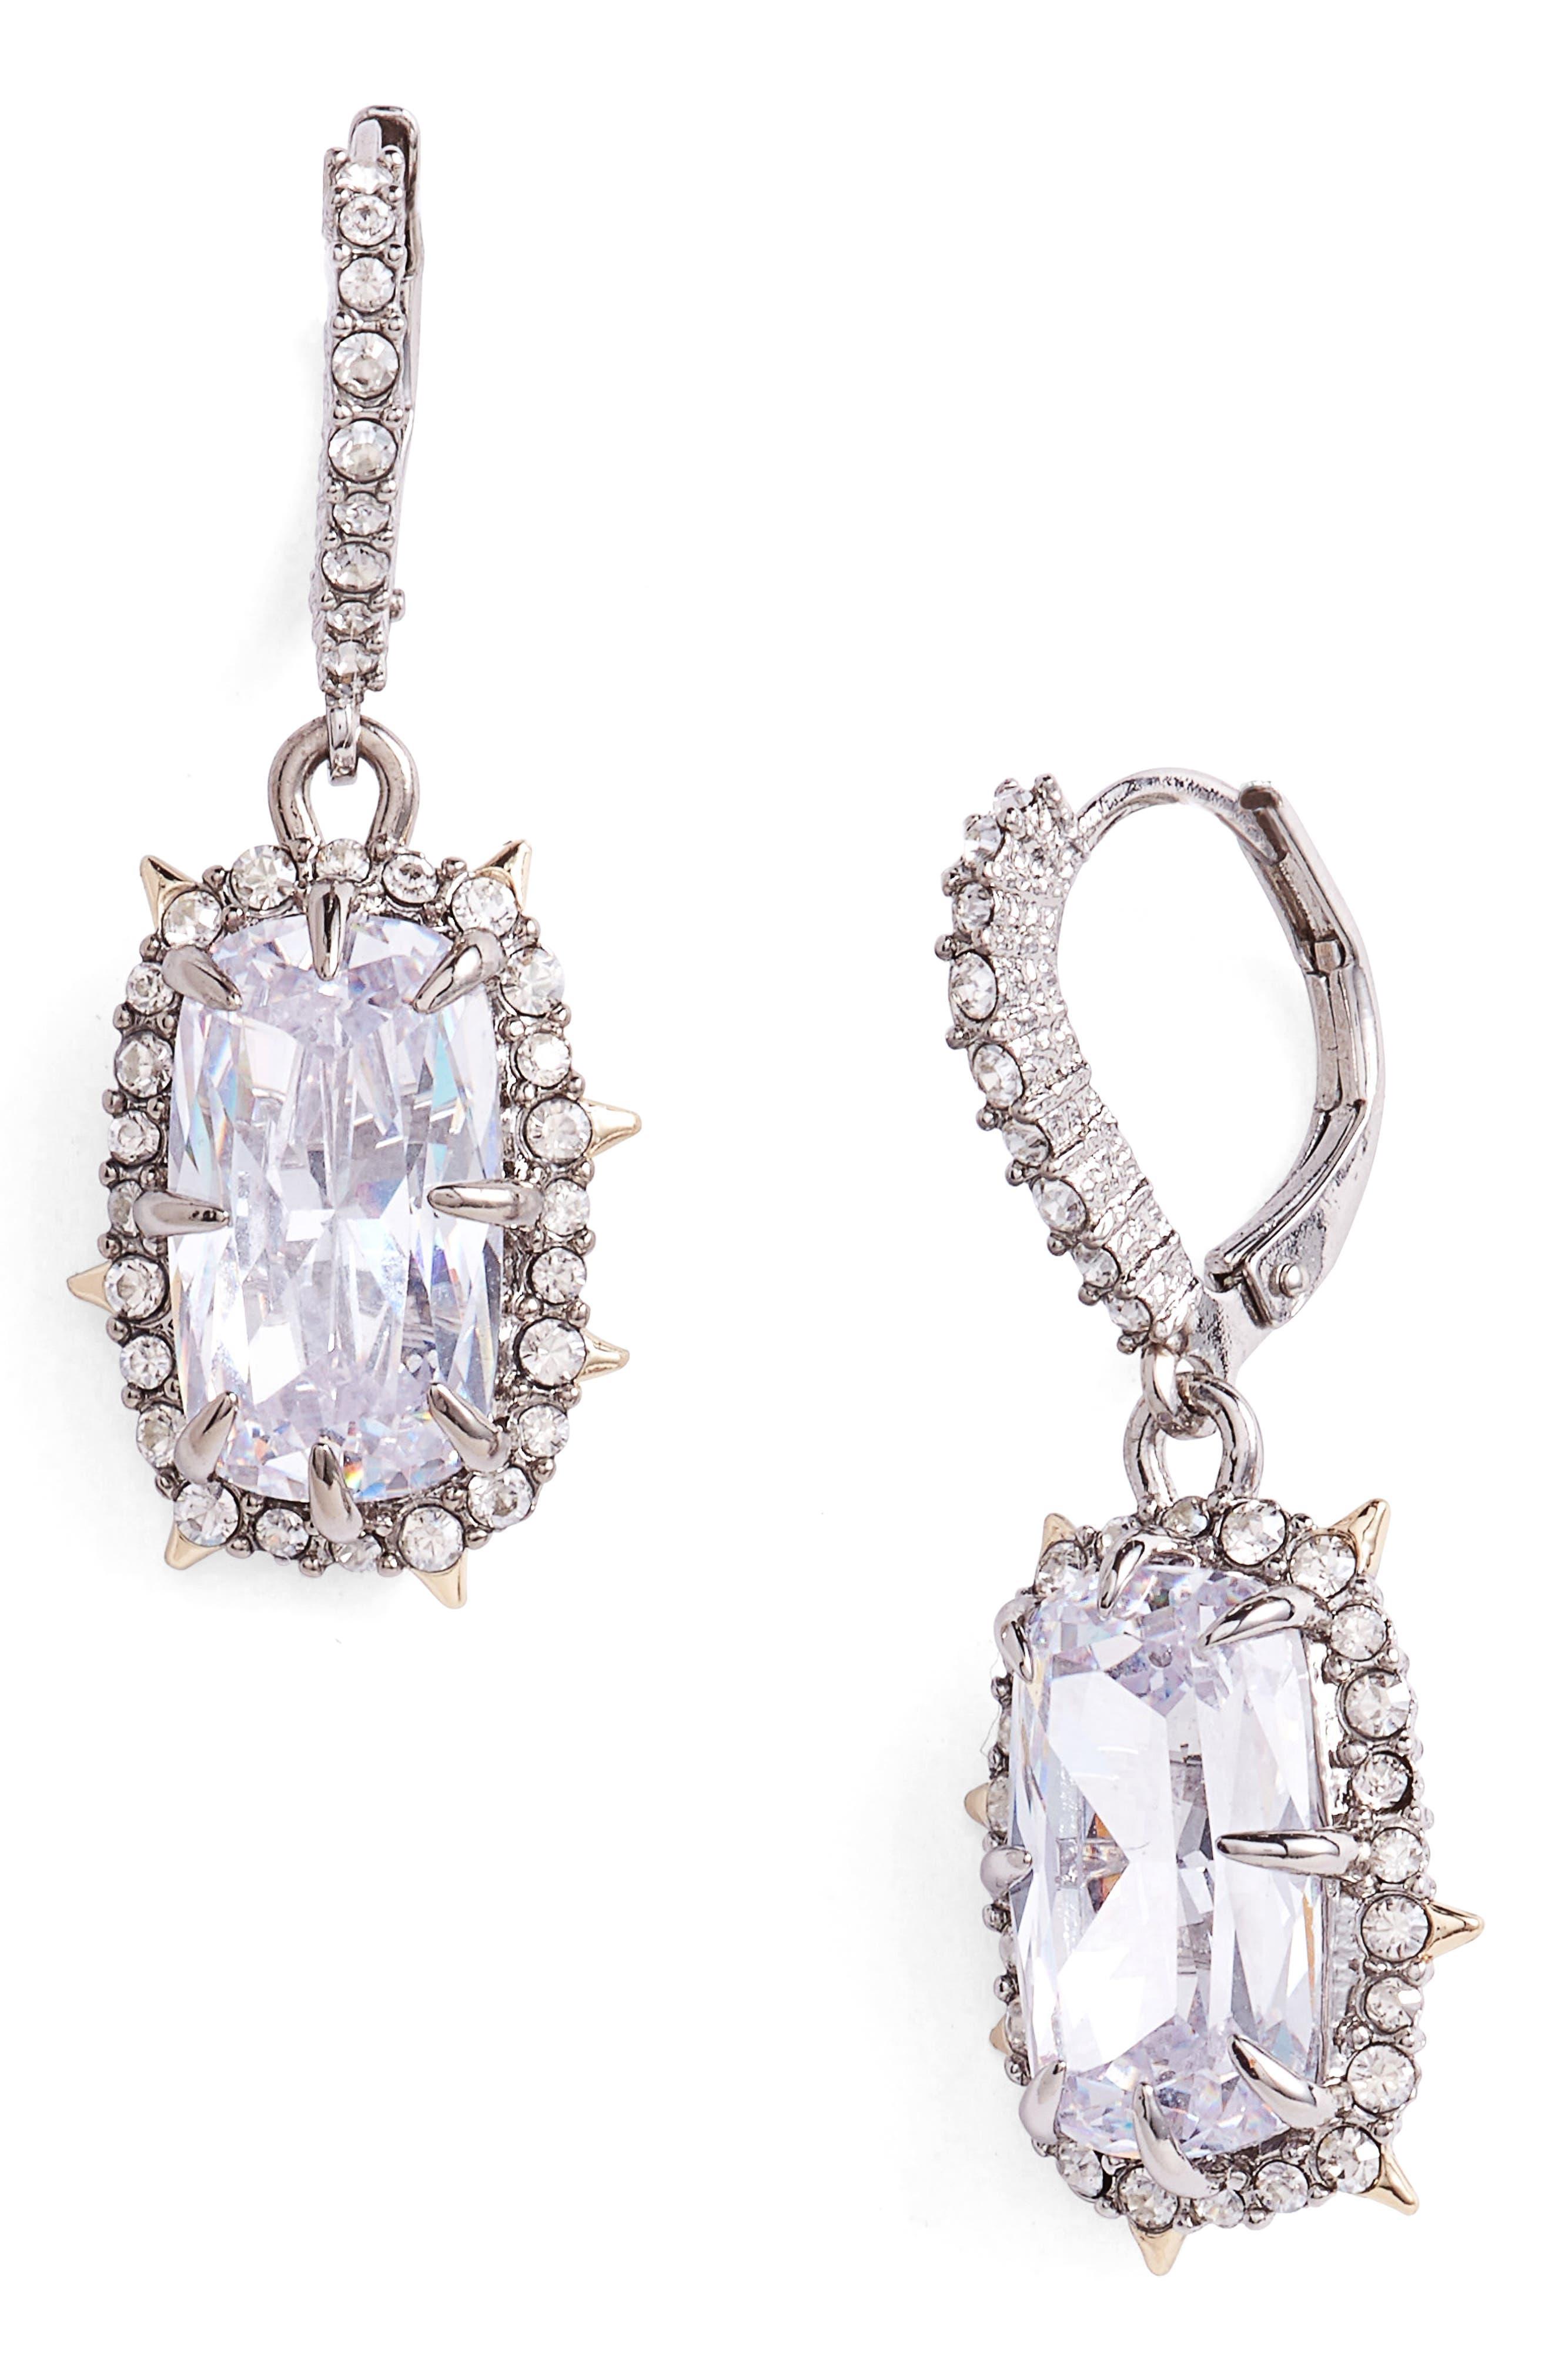 Swarovski Crystal Drop Earrings,                             Main thumbnail 1, color,                             GOLD